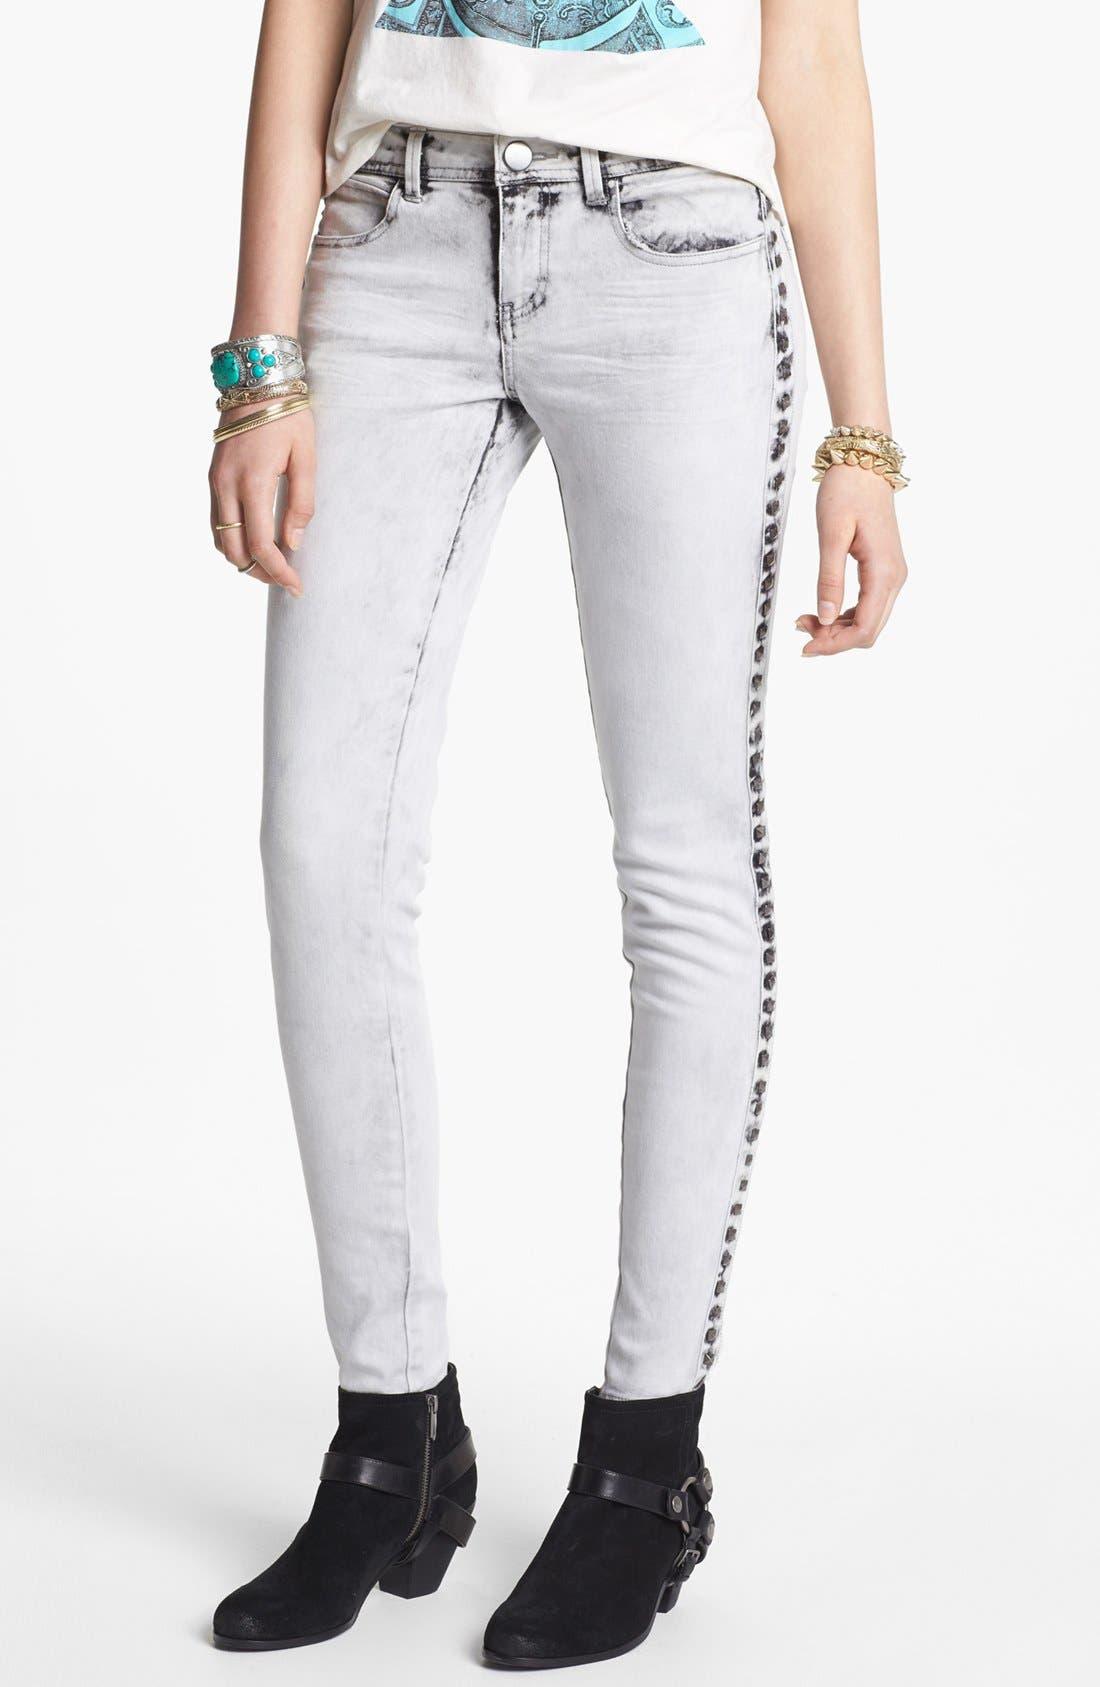 Alternate Image 1 Selected - Fire Studded Acid Wash Skinny Jeans (Grey) (Juniors)